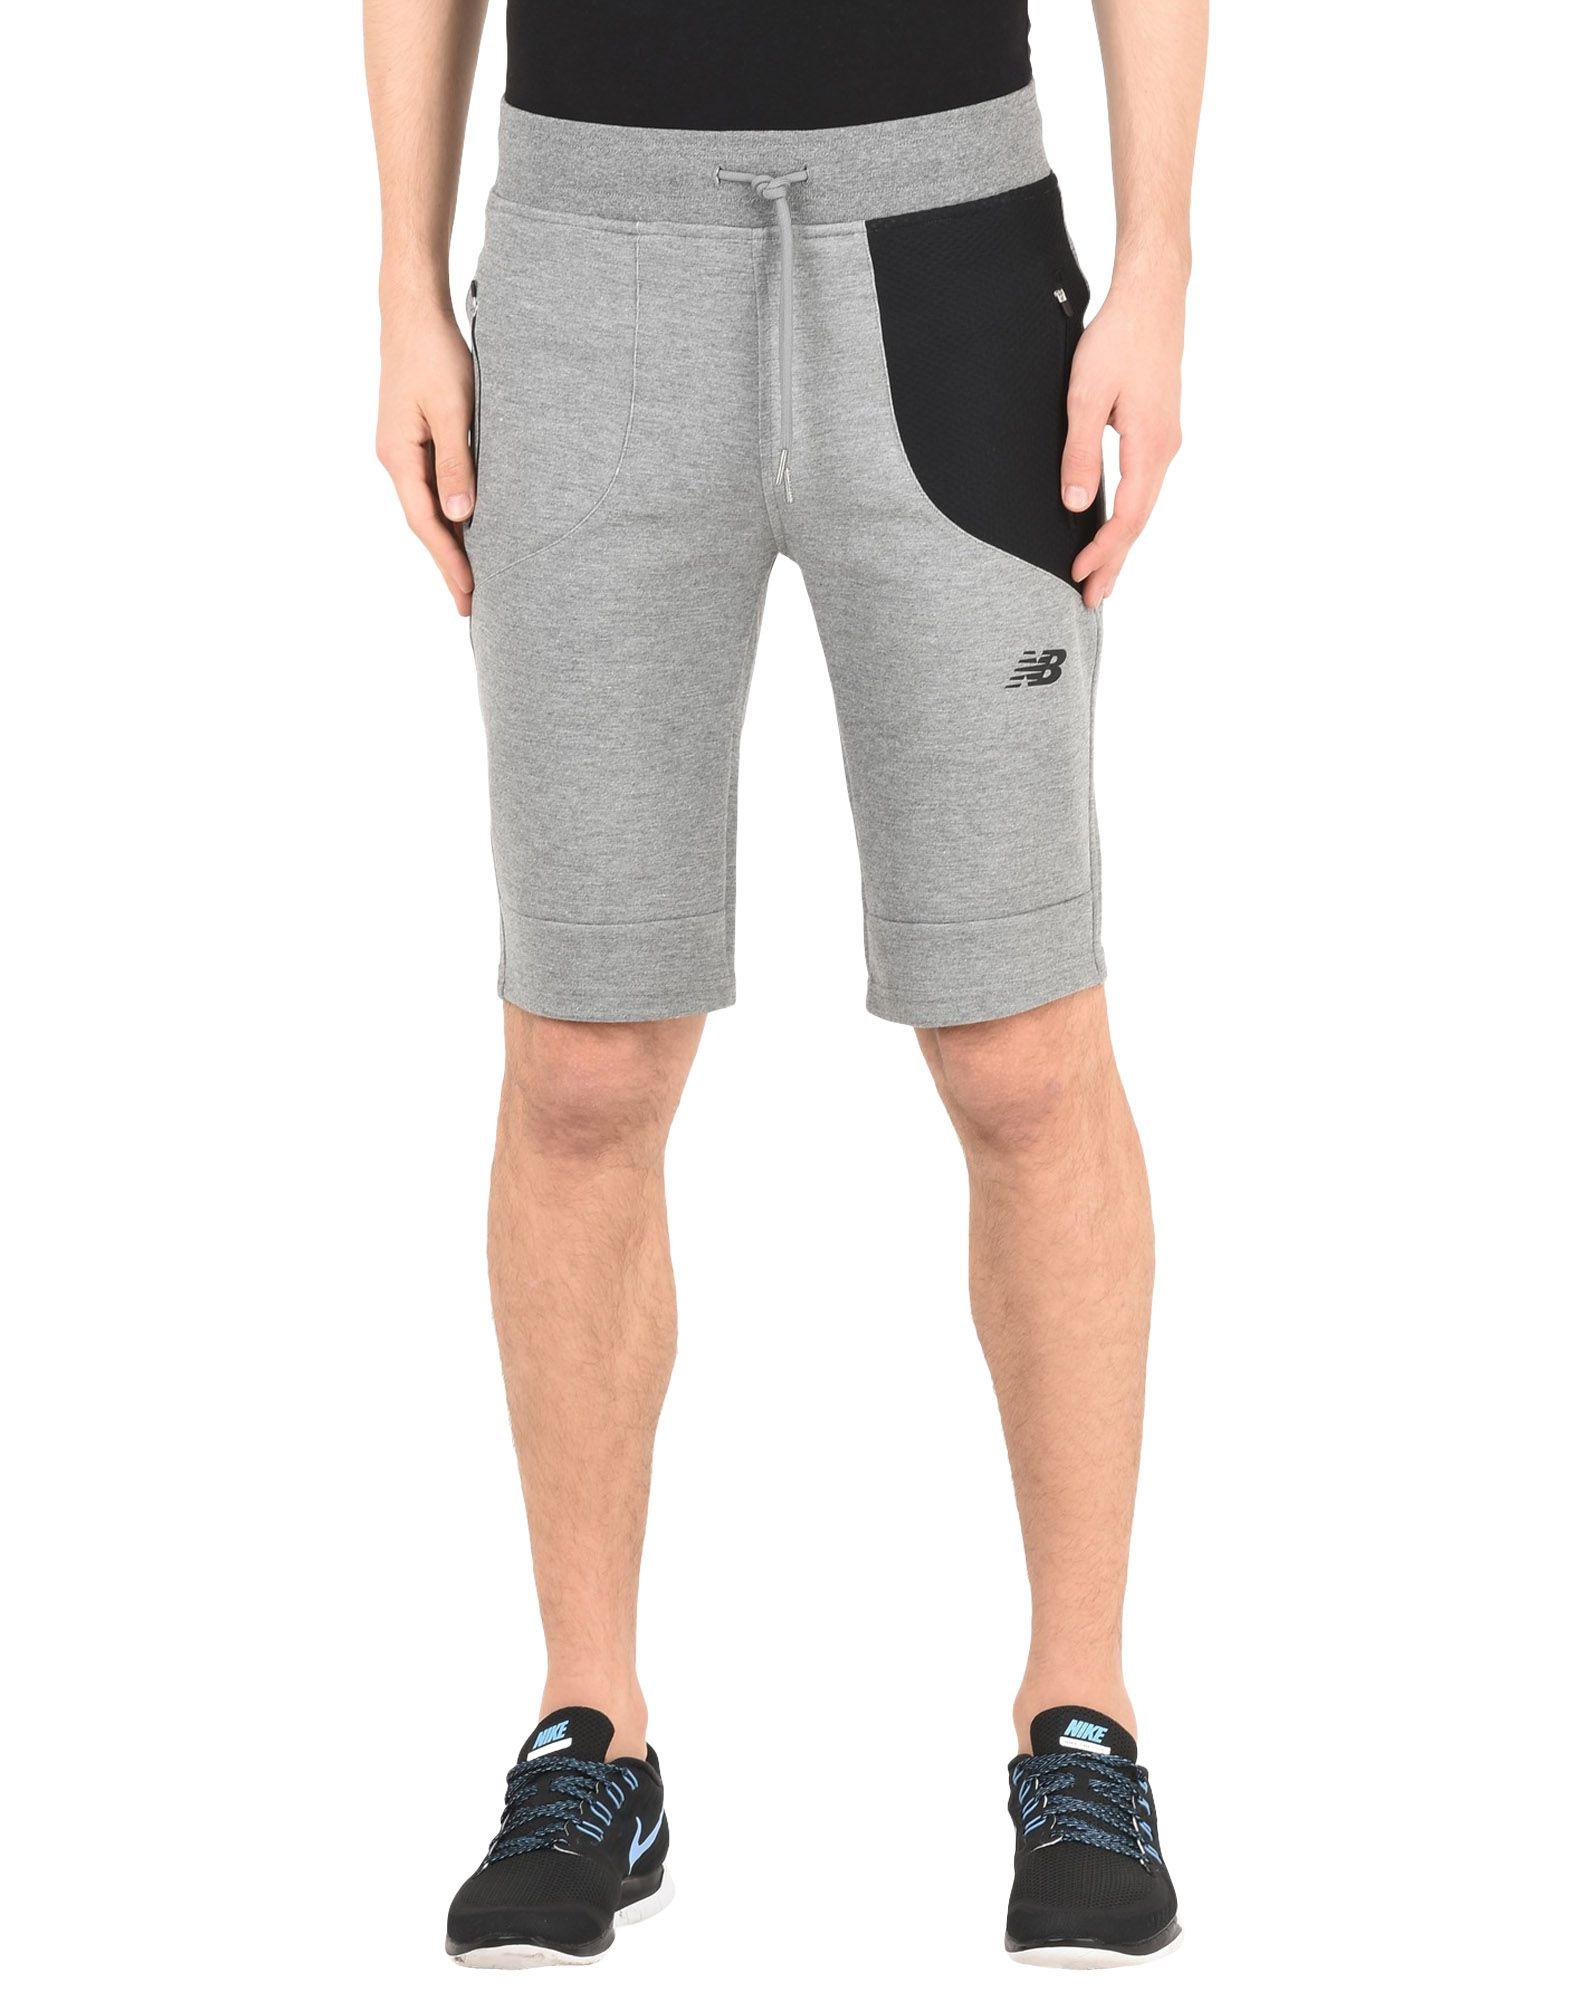 Pantalone Sportivo Nuovo Balance Sportech Short - Uomo 13011078ER - 13011078ER Uomo 722169